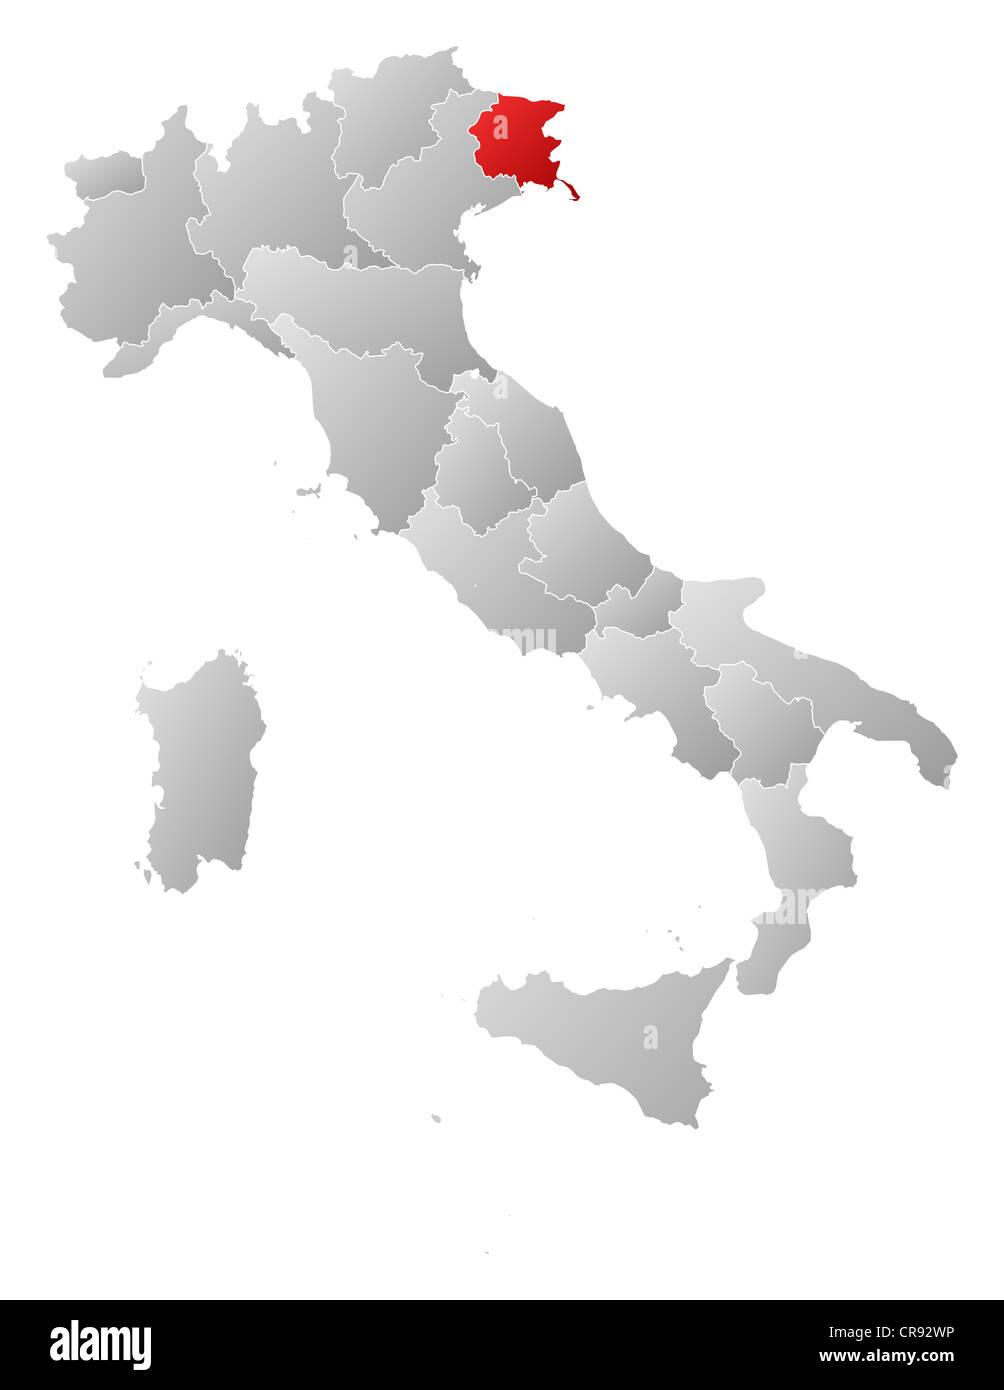 Cartina Friuli Venezia Giulia.Friuli Venezia Giulia Vector High Resolution Stock Photography And Images Alamy